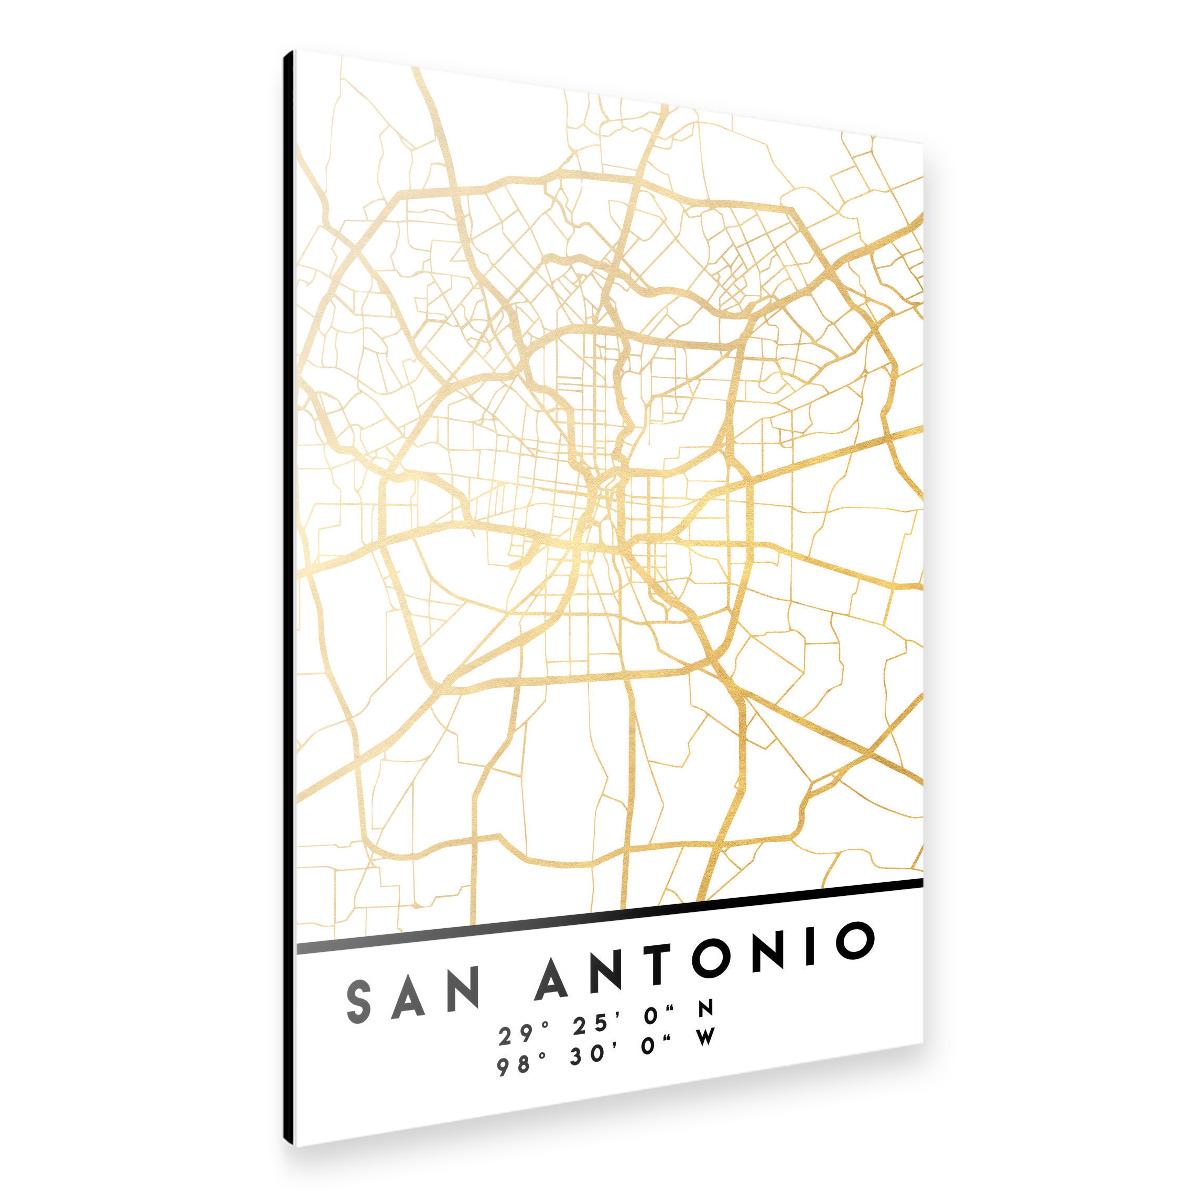 SAN ANTONIO TEXAS STREET MAP als Alu-Print bei artboxONE kaufen